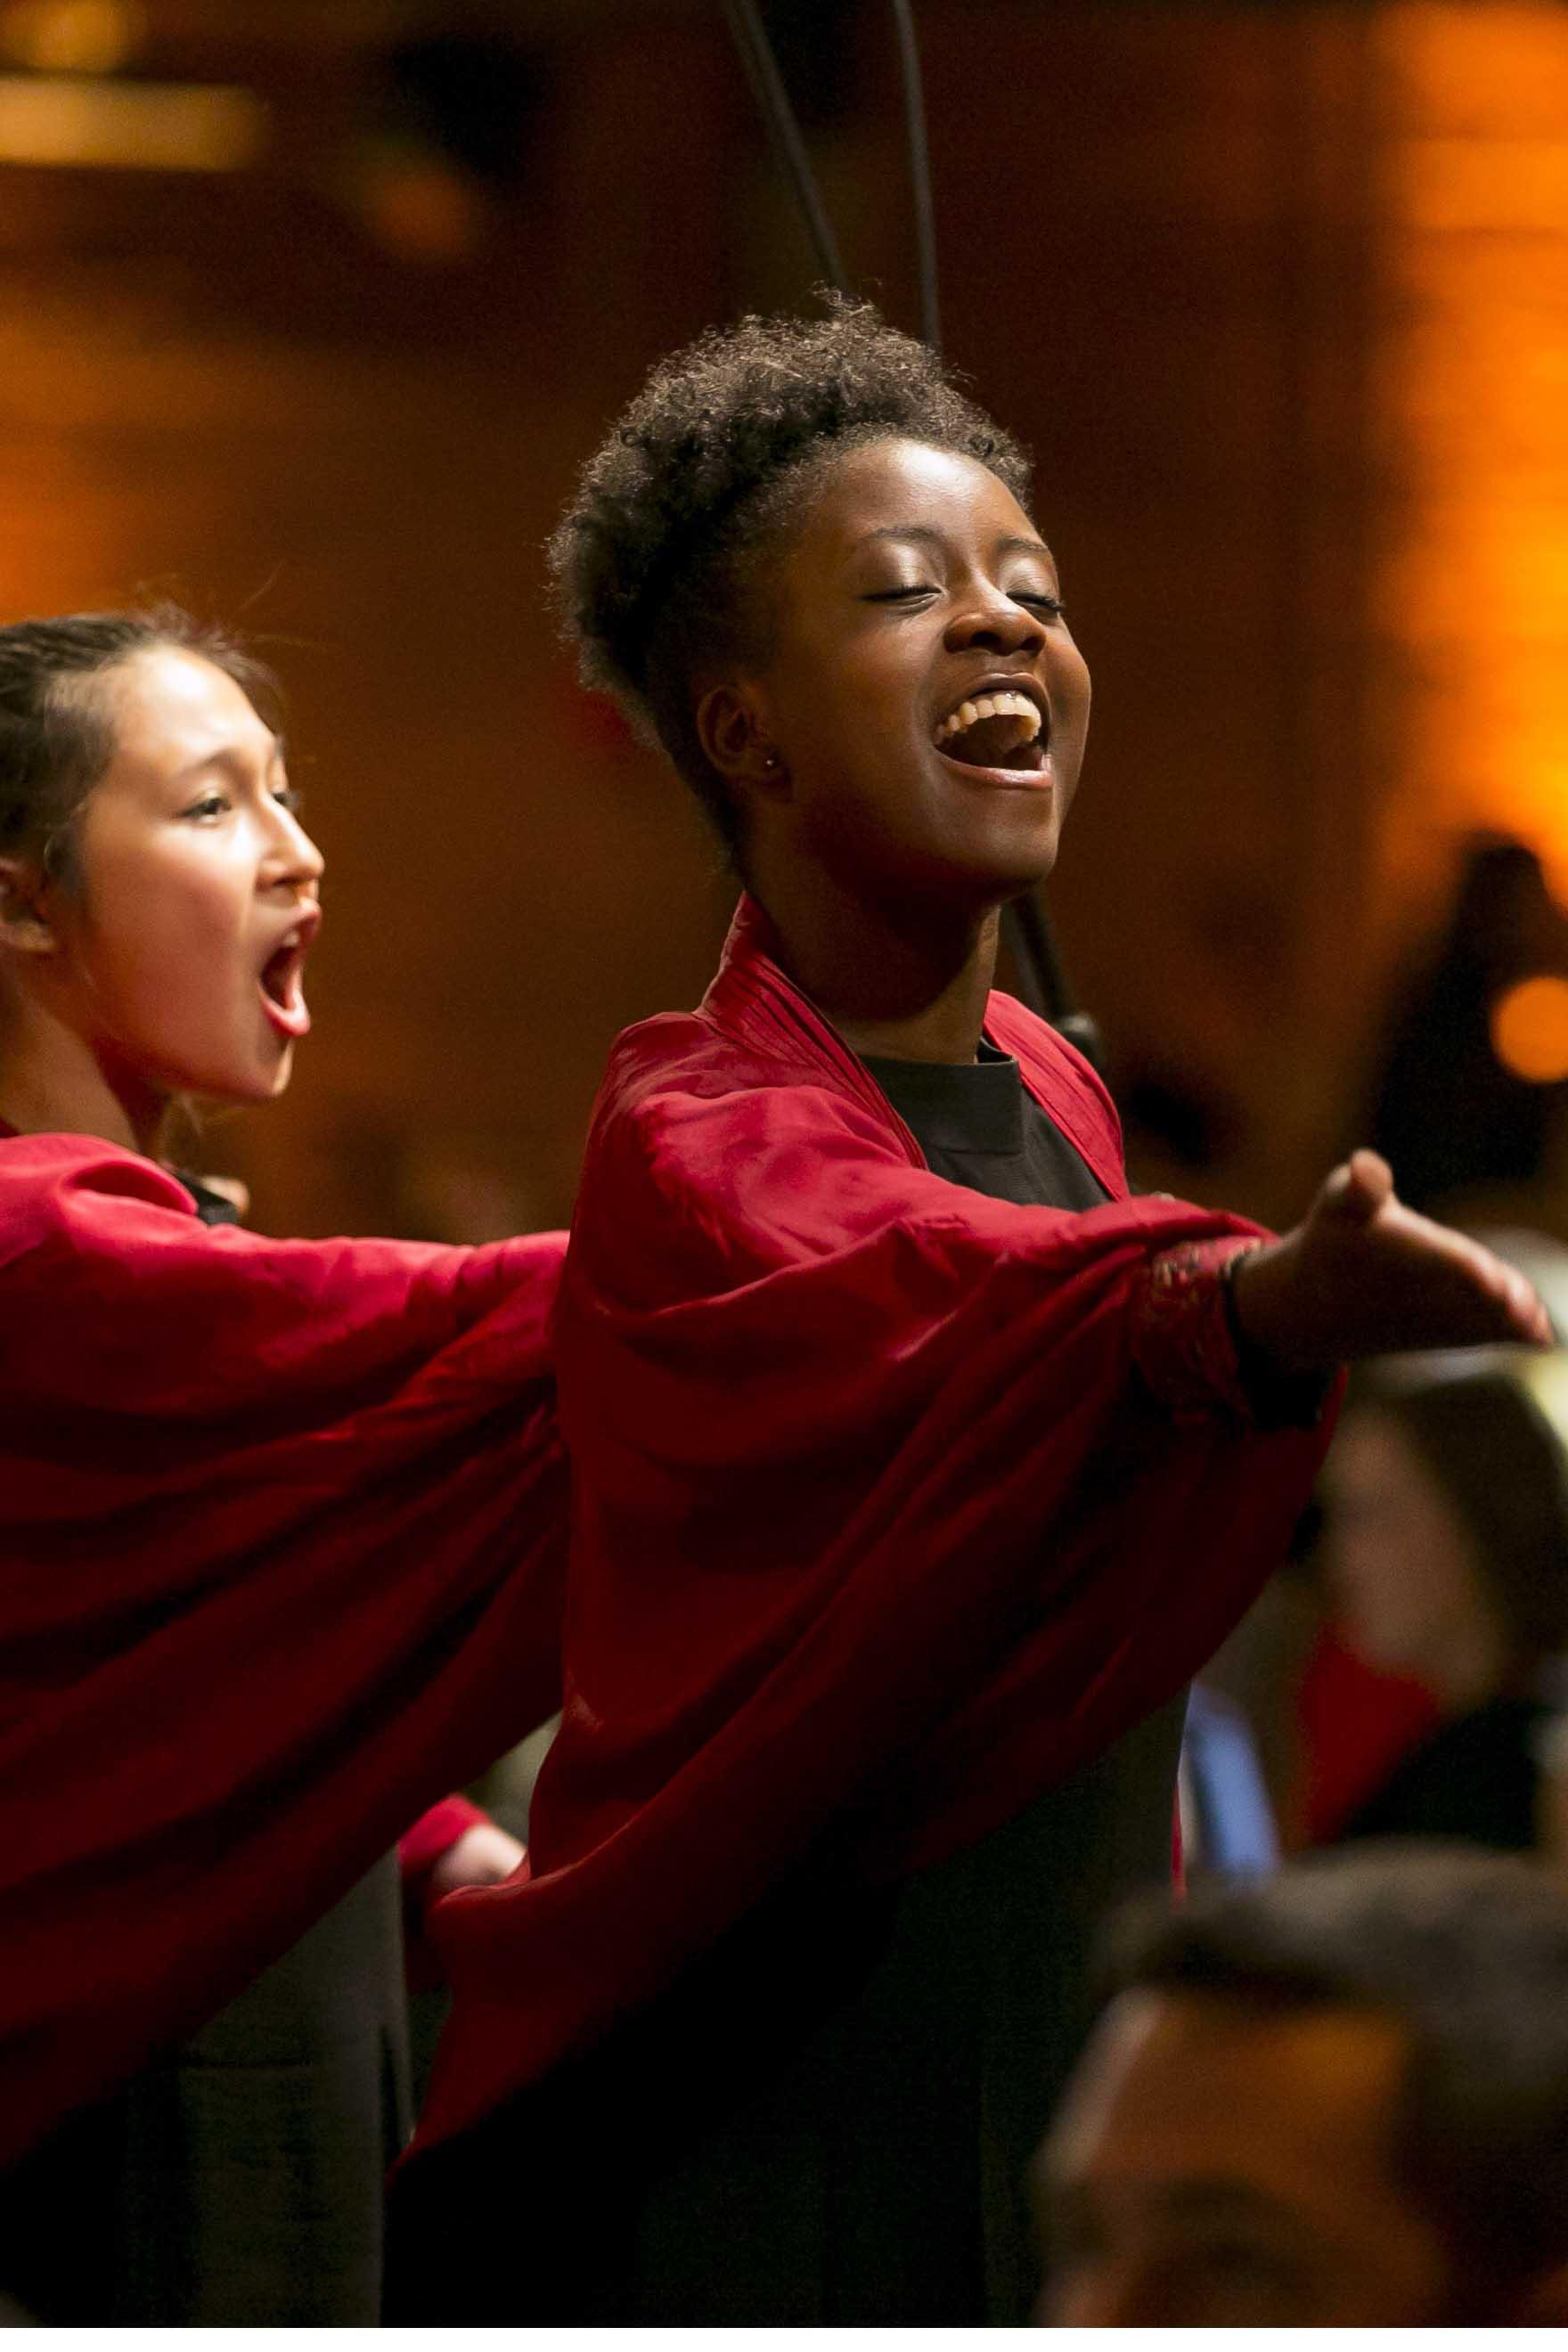 10/23/15 7:48:30 PM -- Chicago Children's Choir Red Jacket Optional honoring Joe and Jennifer Shanahan   © Todd Rosenberg Photography 2015